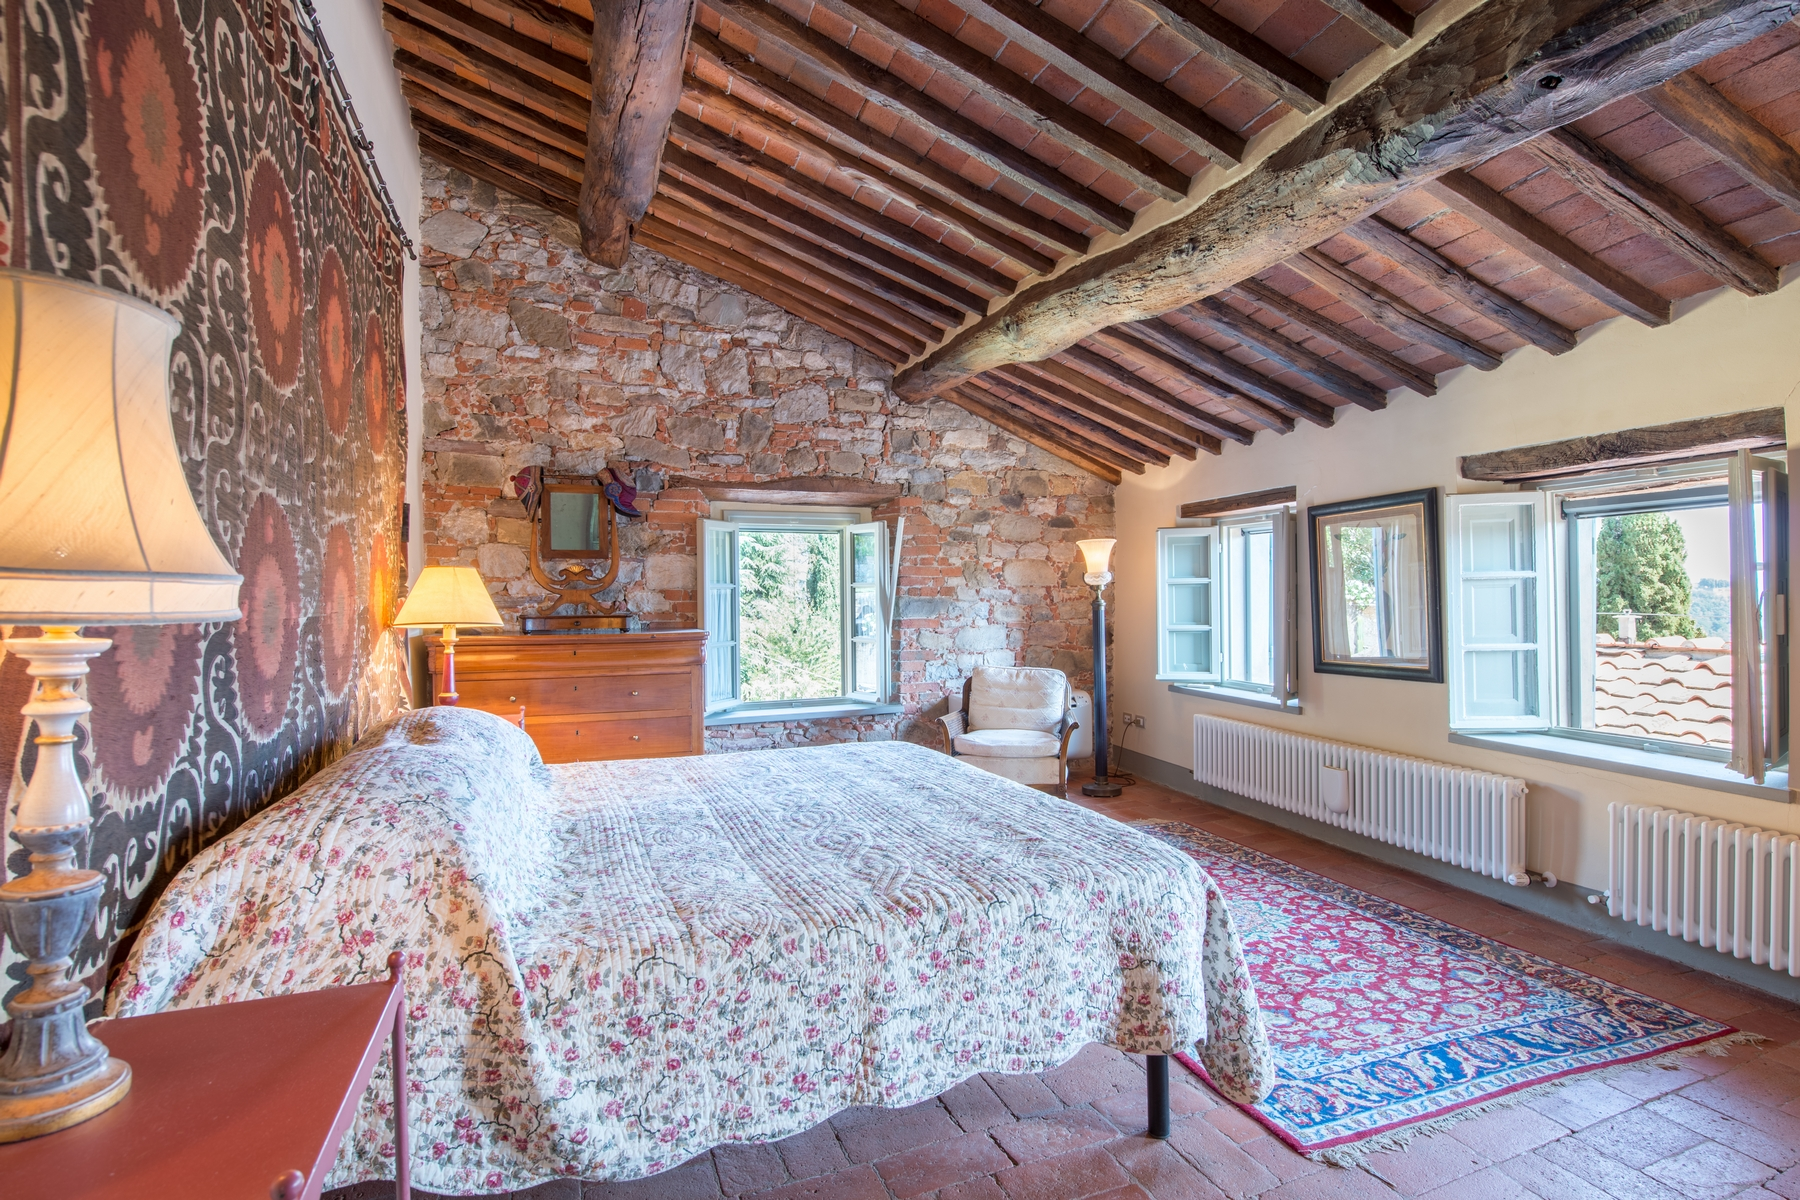 Villa in Vendita a Lucca: 5 locali, 2500 mq - Foto 7